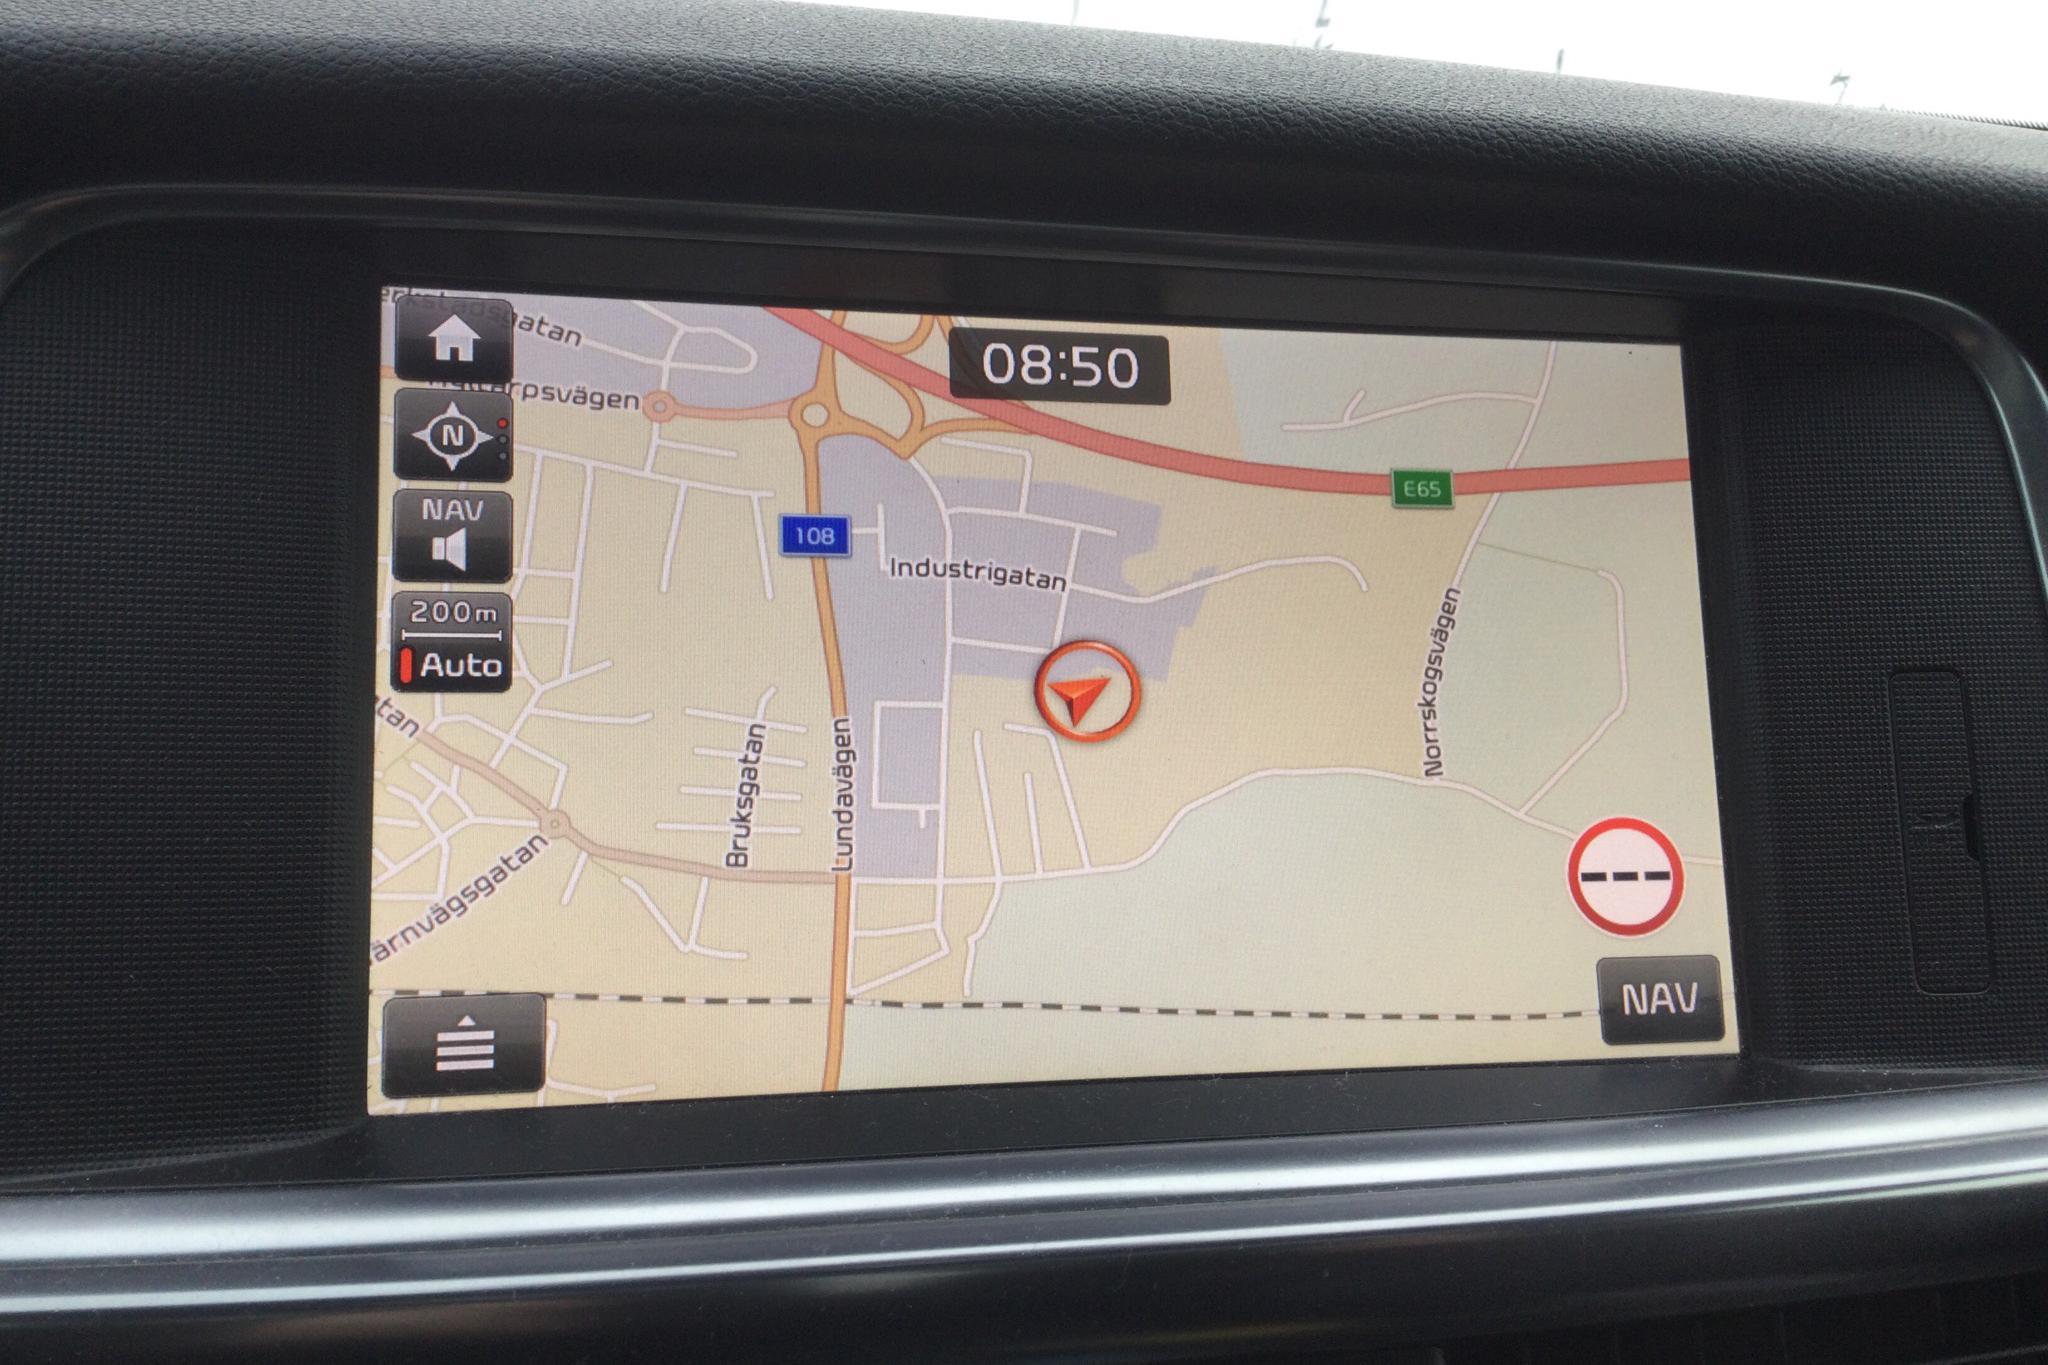 KIA Optima 1.7 CRDi SW (141hk) - 40 790 km - Automatic - gray - 2017